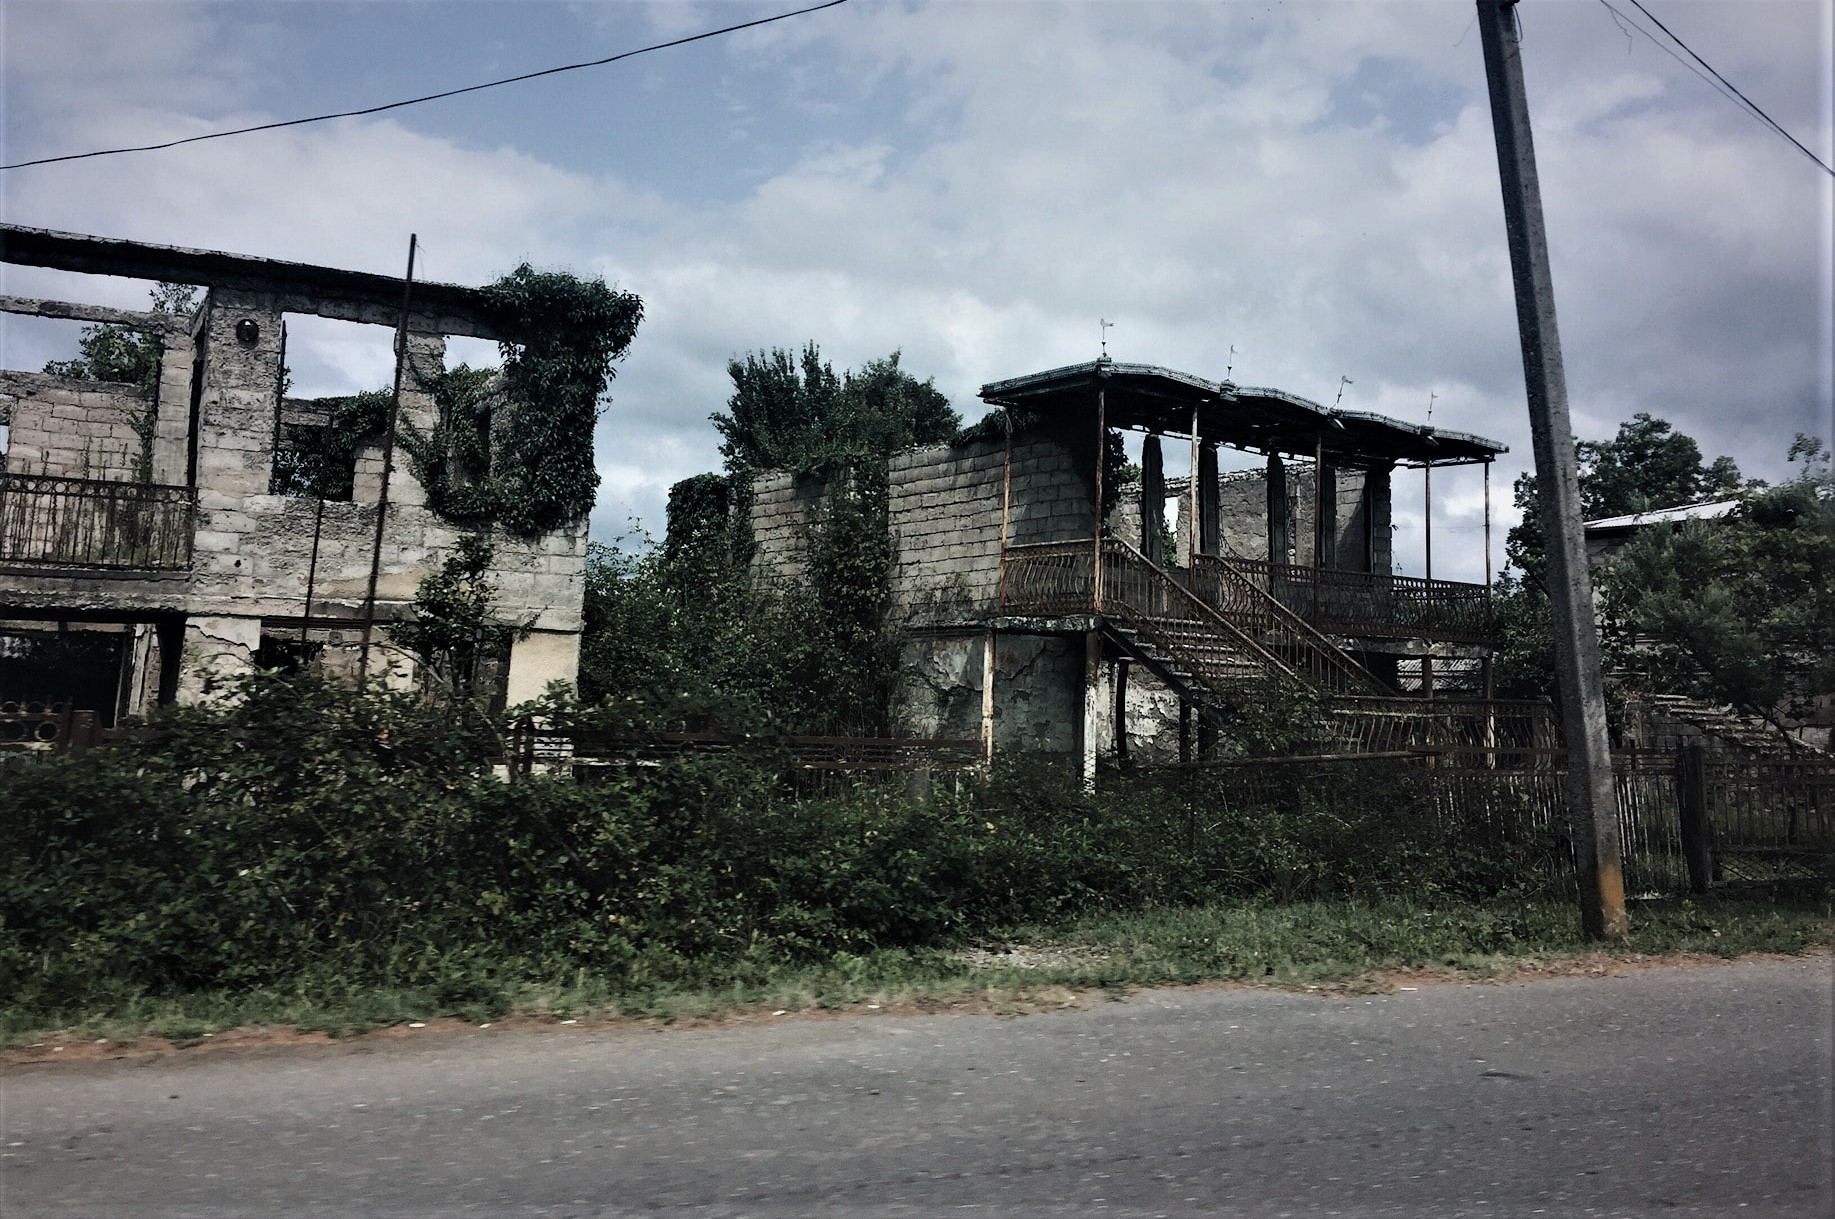 DPDE7566 min #политика featured, Абхазия, Грузия-Россия, недвижимость